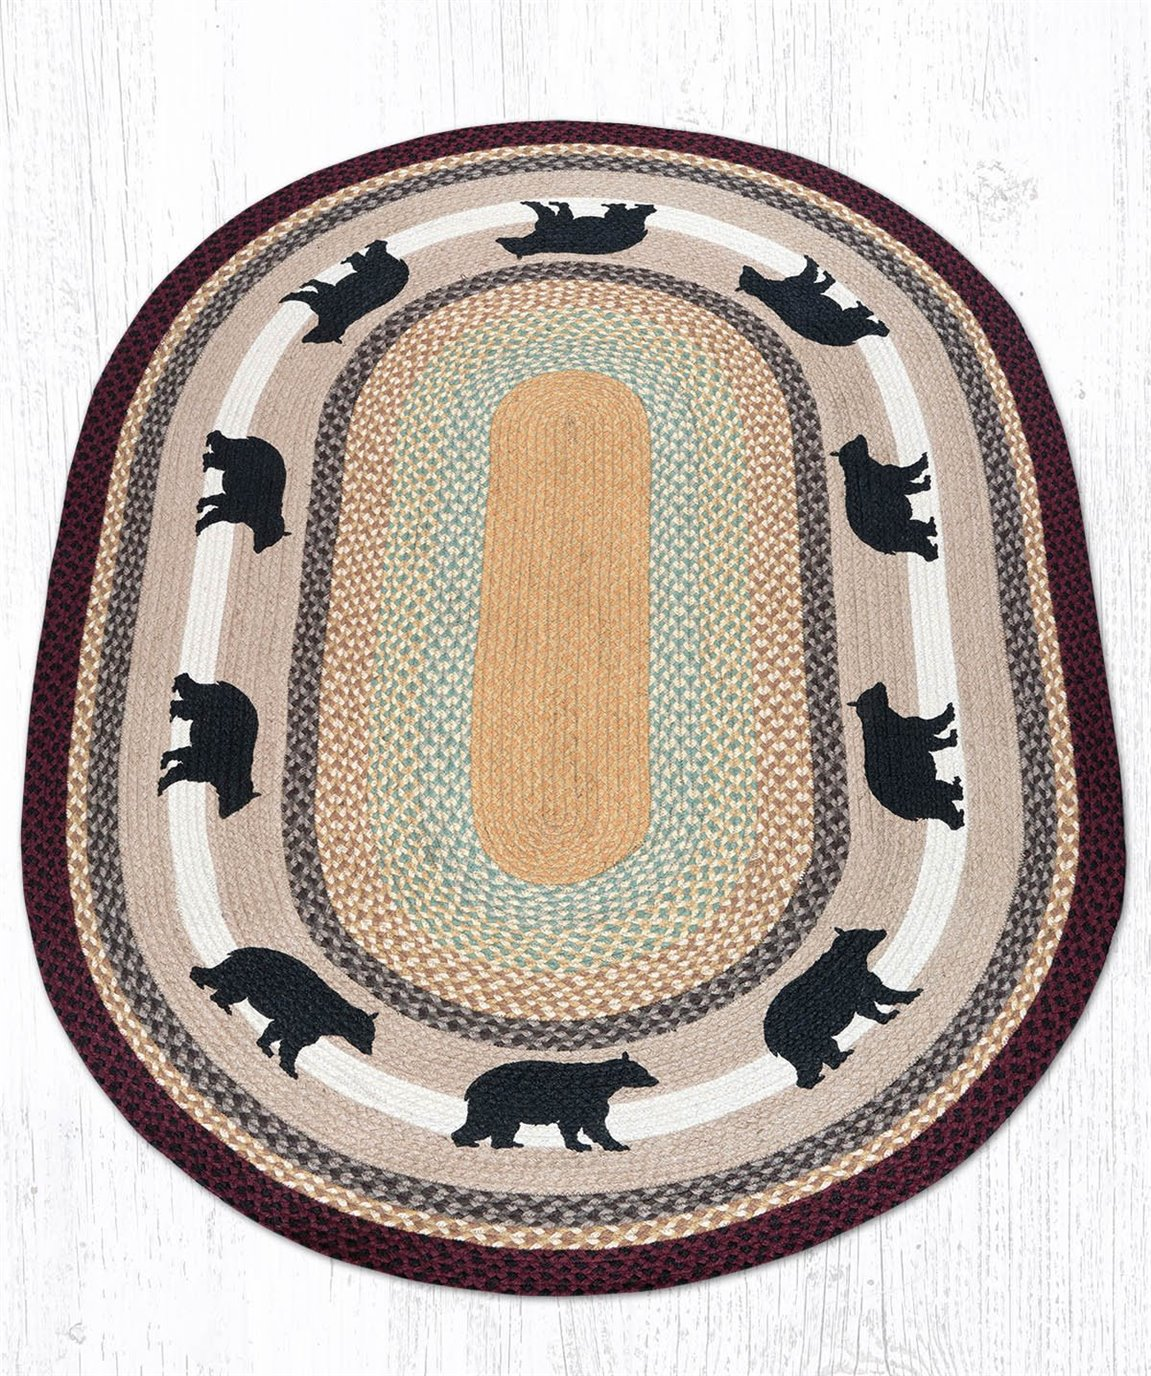 Cabin Bear Oval Braided Rug 4'x6'